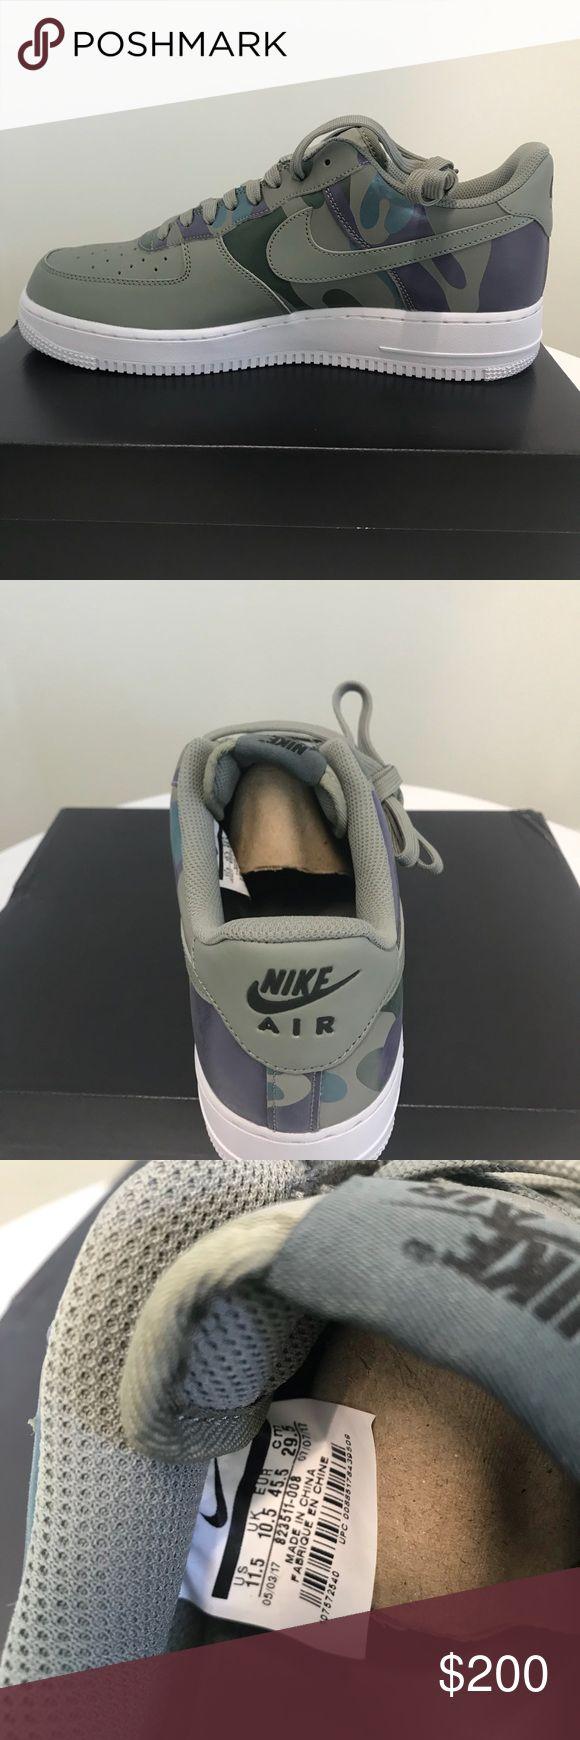 NIB Men's Nike original Air Force 1 sz 11.5 Never been worn Nike Air Force 1 in Camo Men's 11.5 Nike Shoes Sneakers